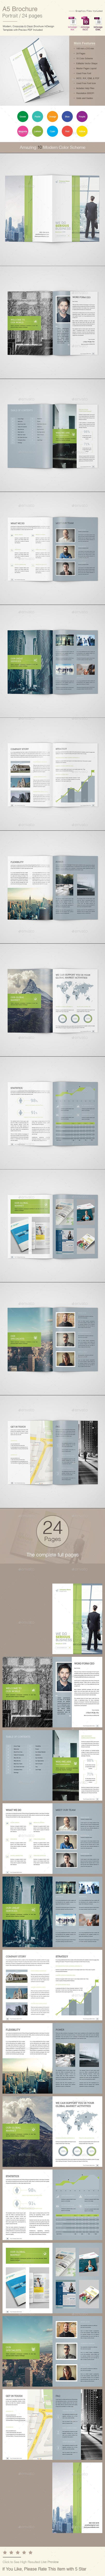 A5 Brochure Portrait - Corporate Brochures